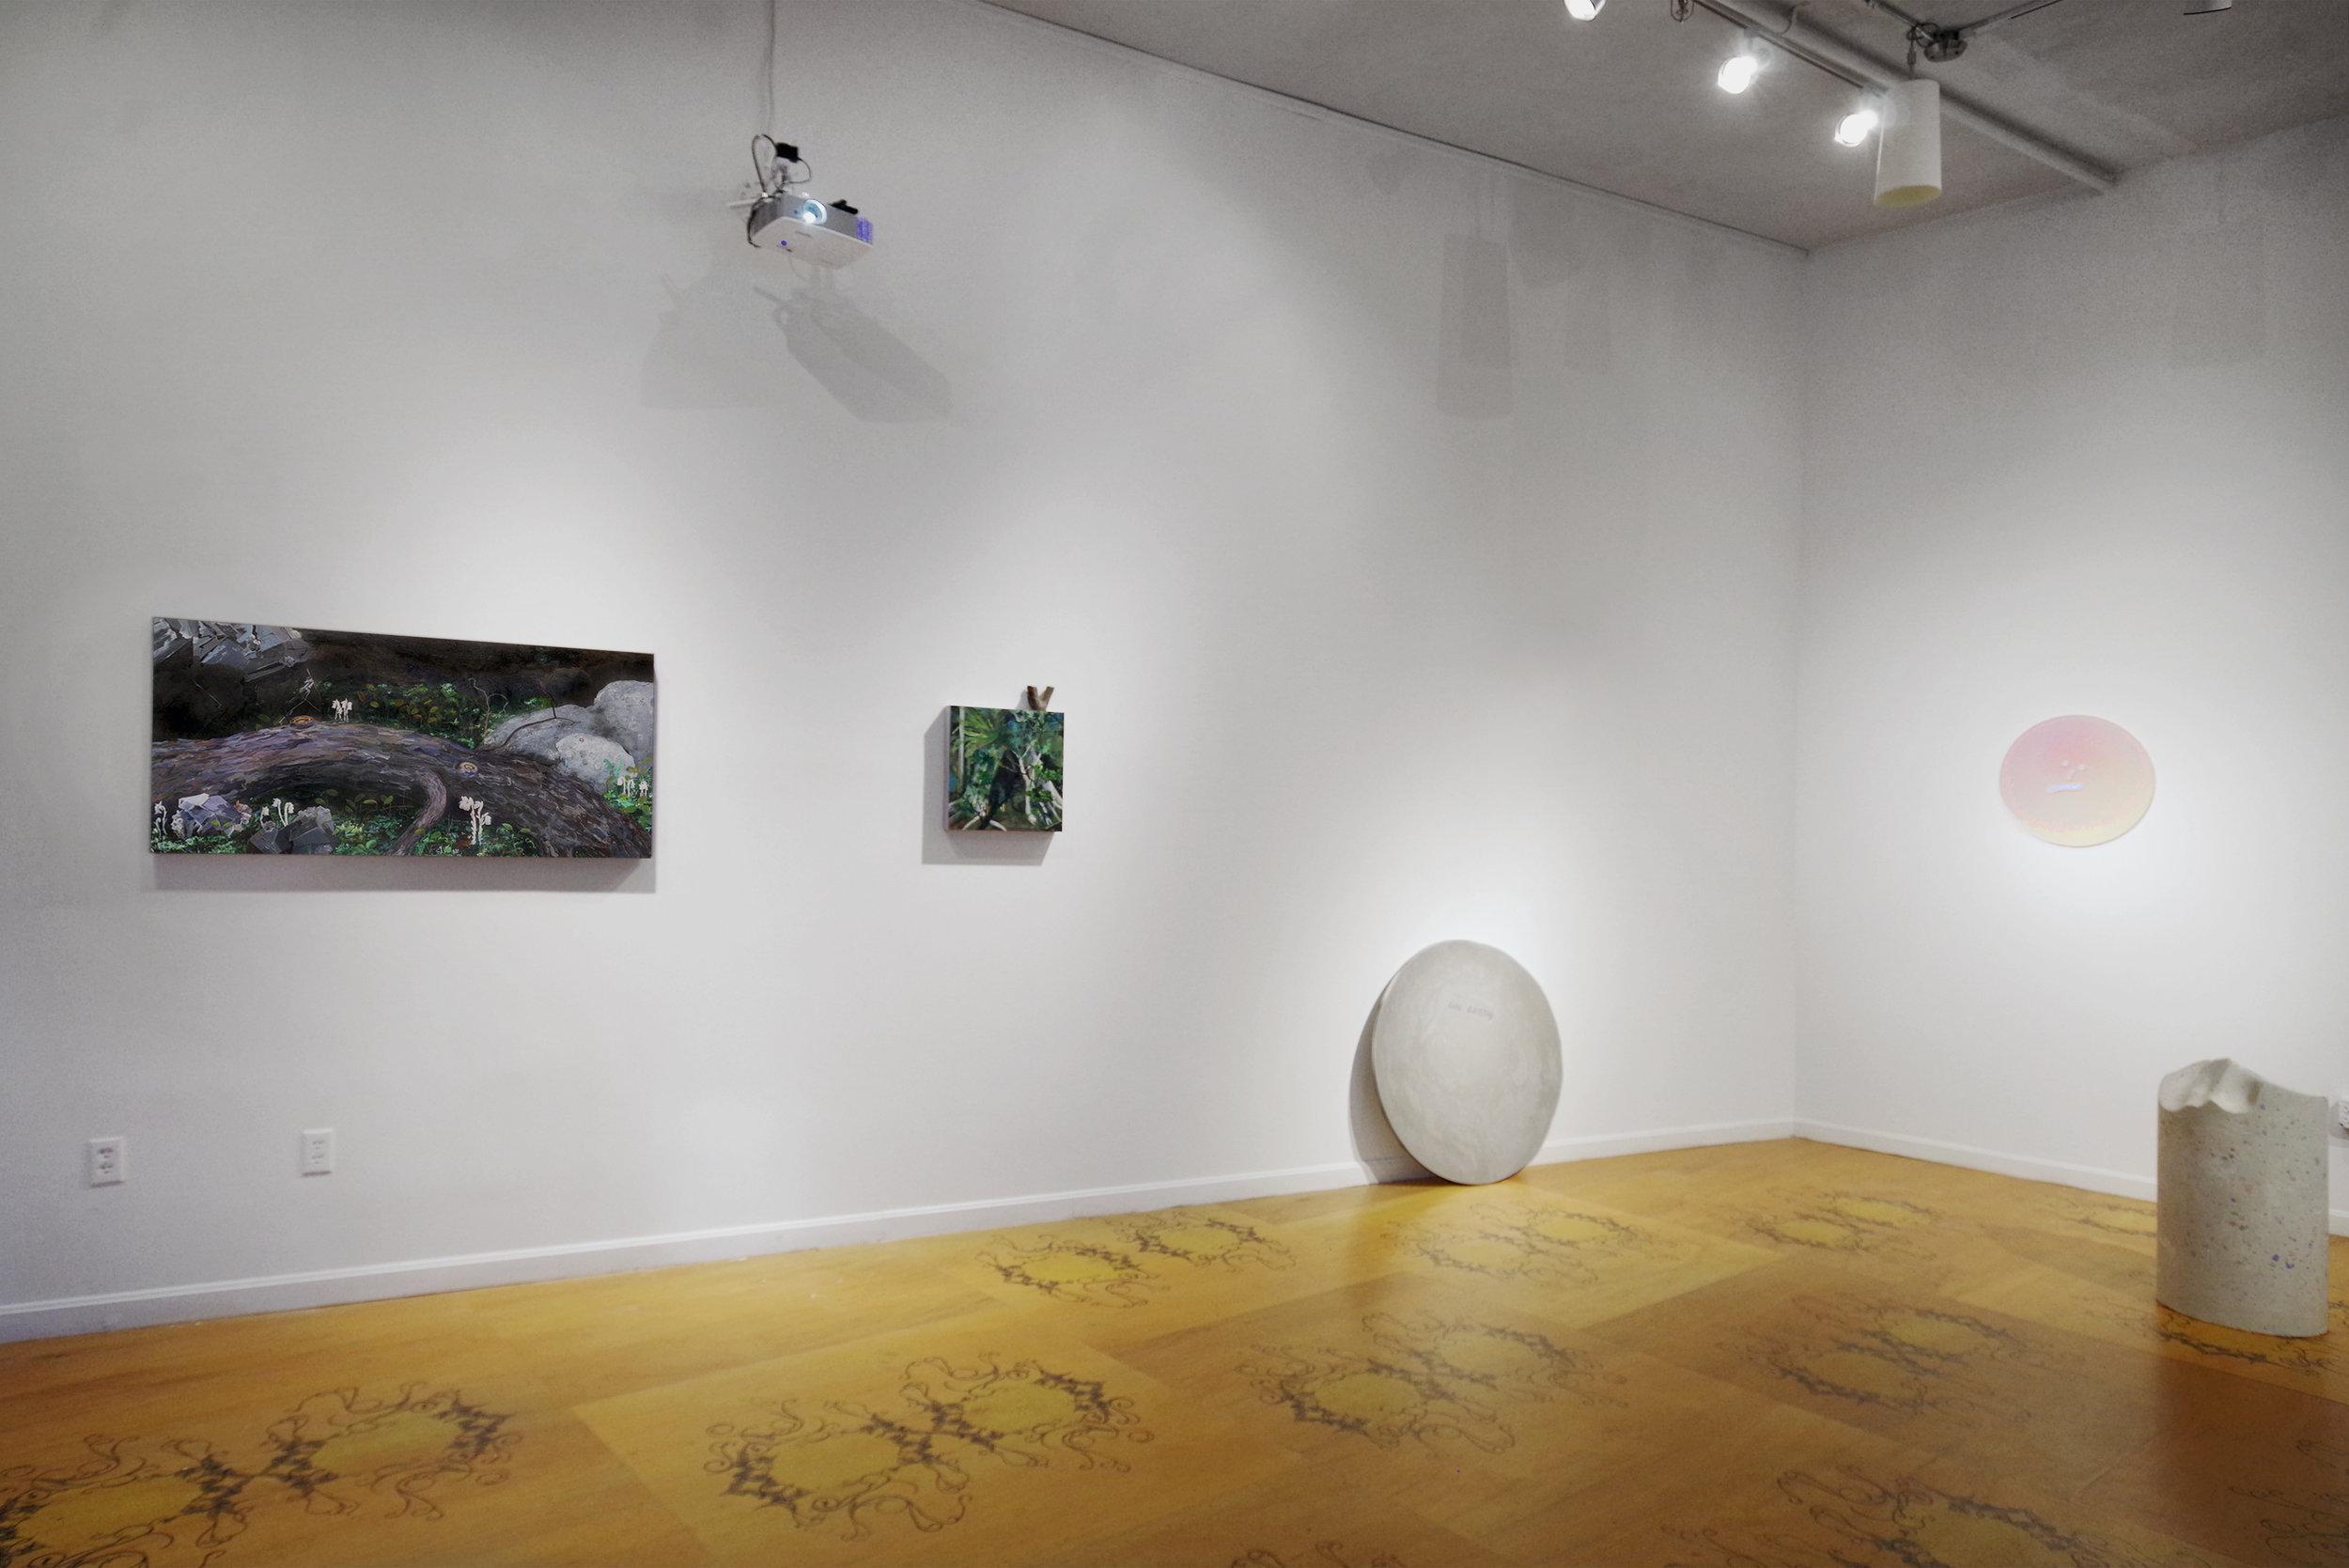 Relative G  round    Devra Freelander, Aimee Odum & Leah Piepgras curated by Corey Oberlander & Linsdey Stapleton   September 2-20, 2016   Machines With Magnets, Pawtucket, RI